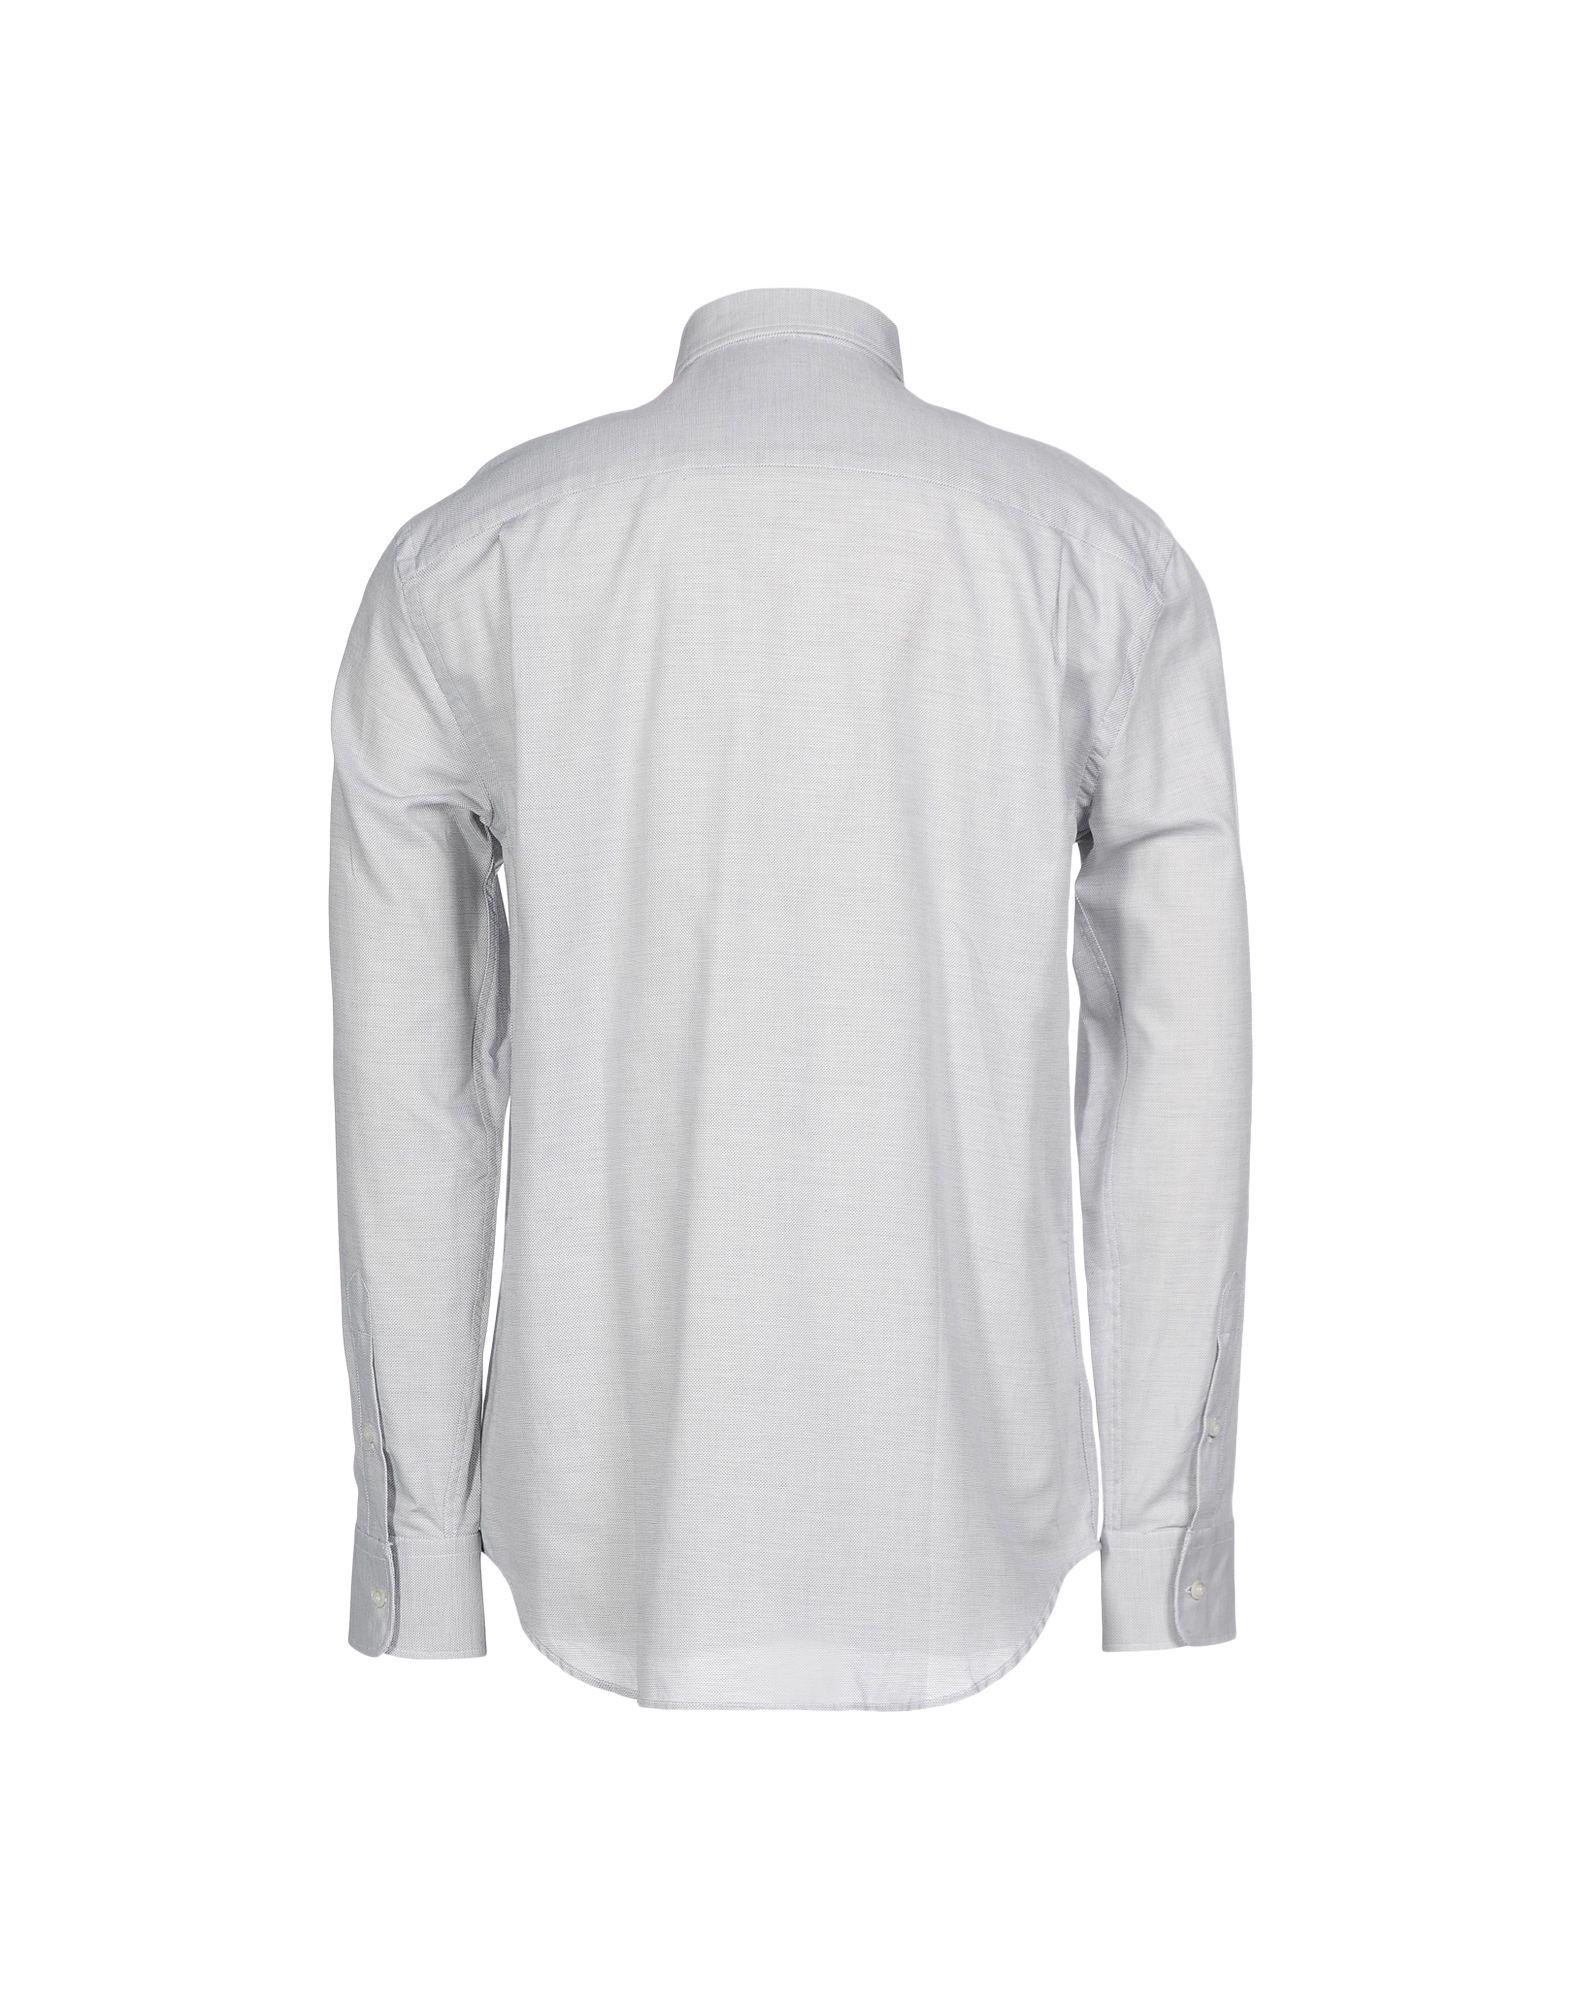 Camicia Fantasia Emporio Armani Uomo - 38681803KR 38681803KR 38681803KR 390812